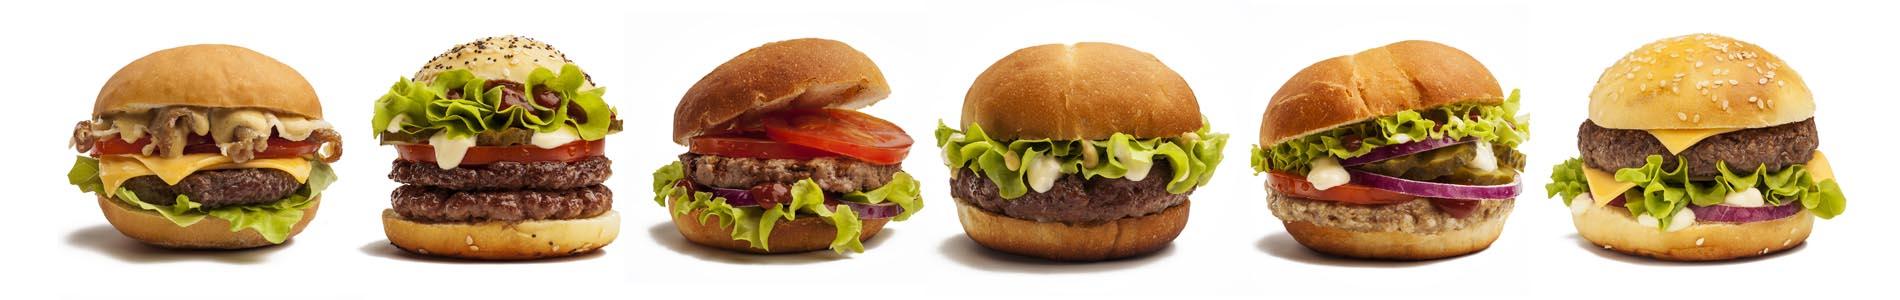 Burger-Bestellen-München-Burger-Buben